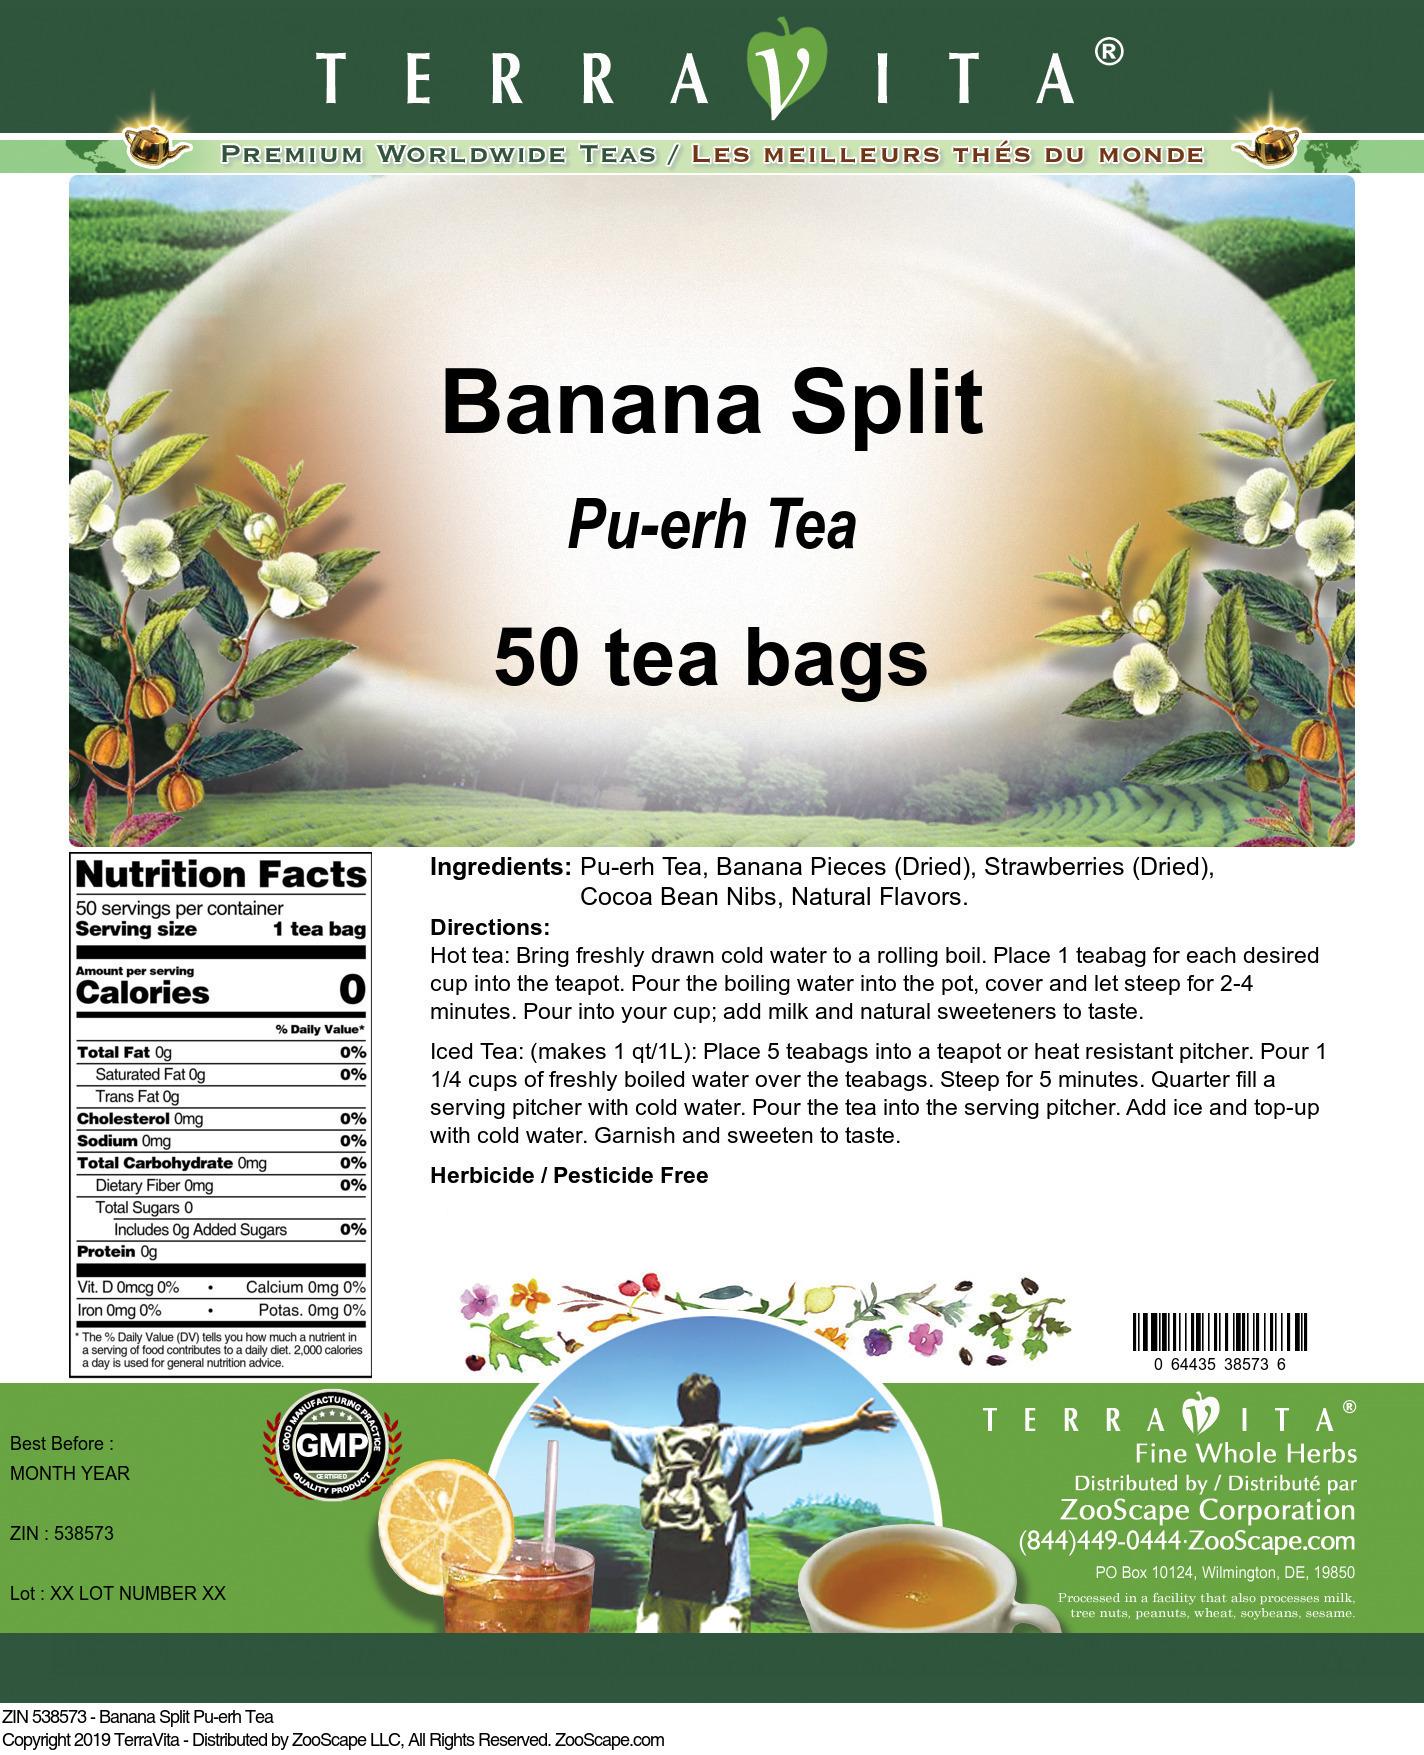 Banana Split Pu-erh Tea